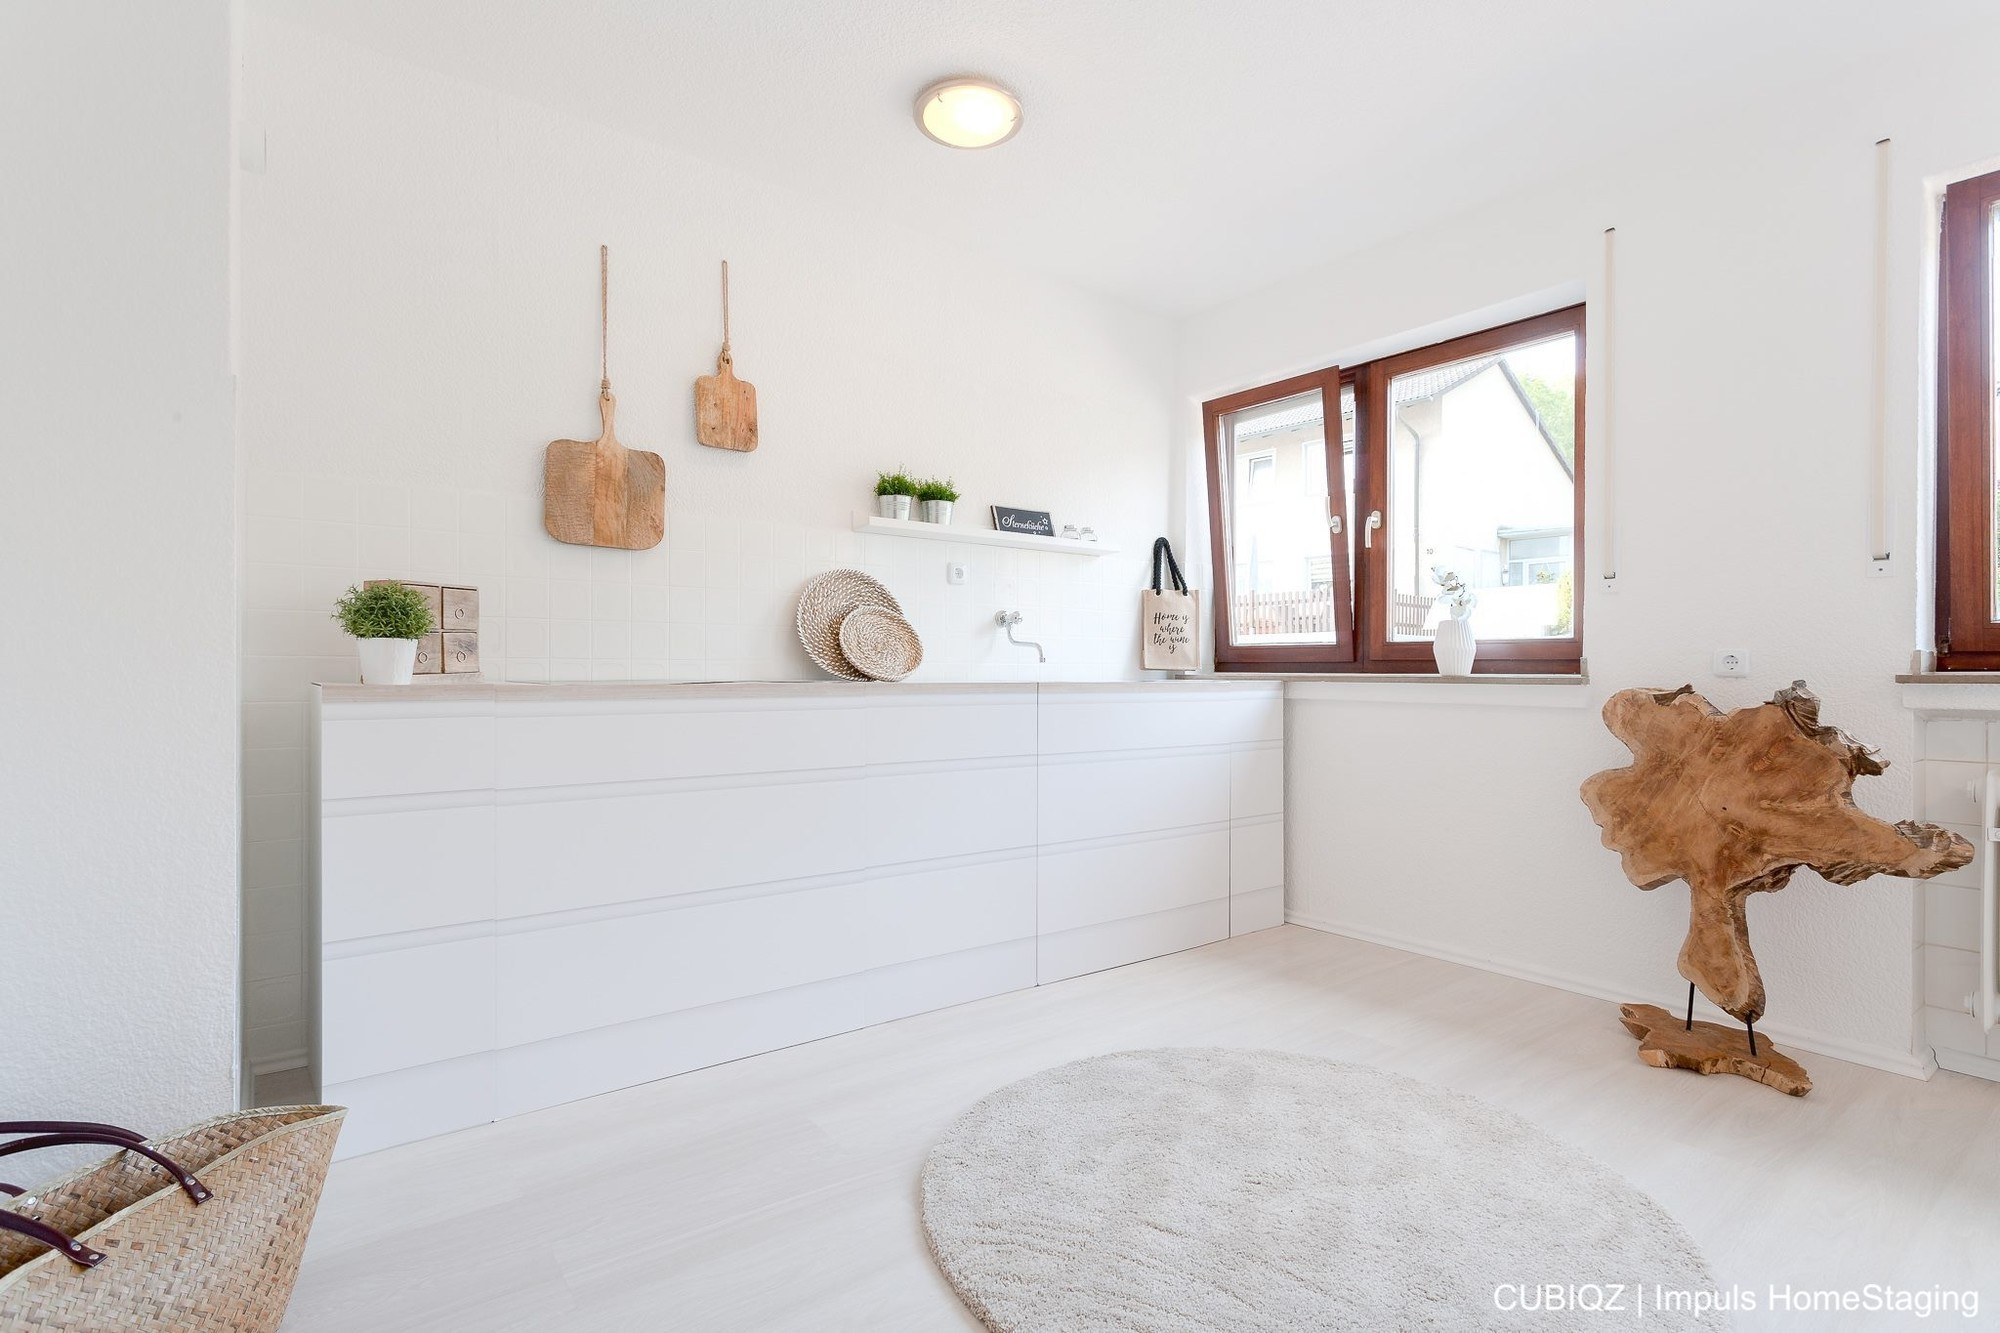 HomeStaging con cucine in cartone cubiqz 1a